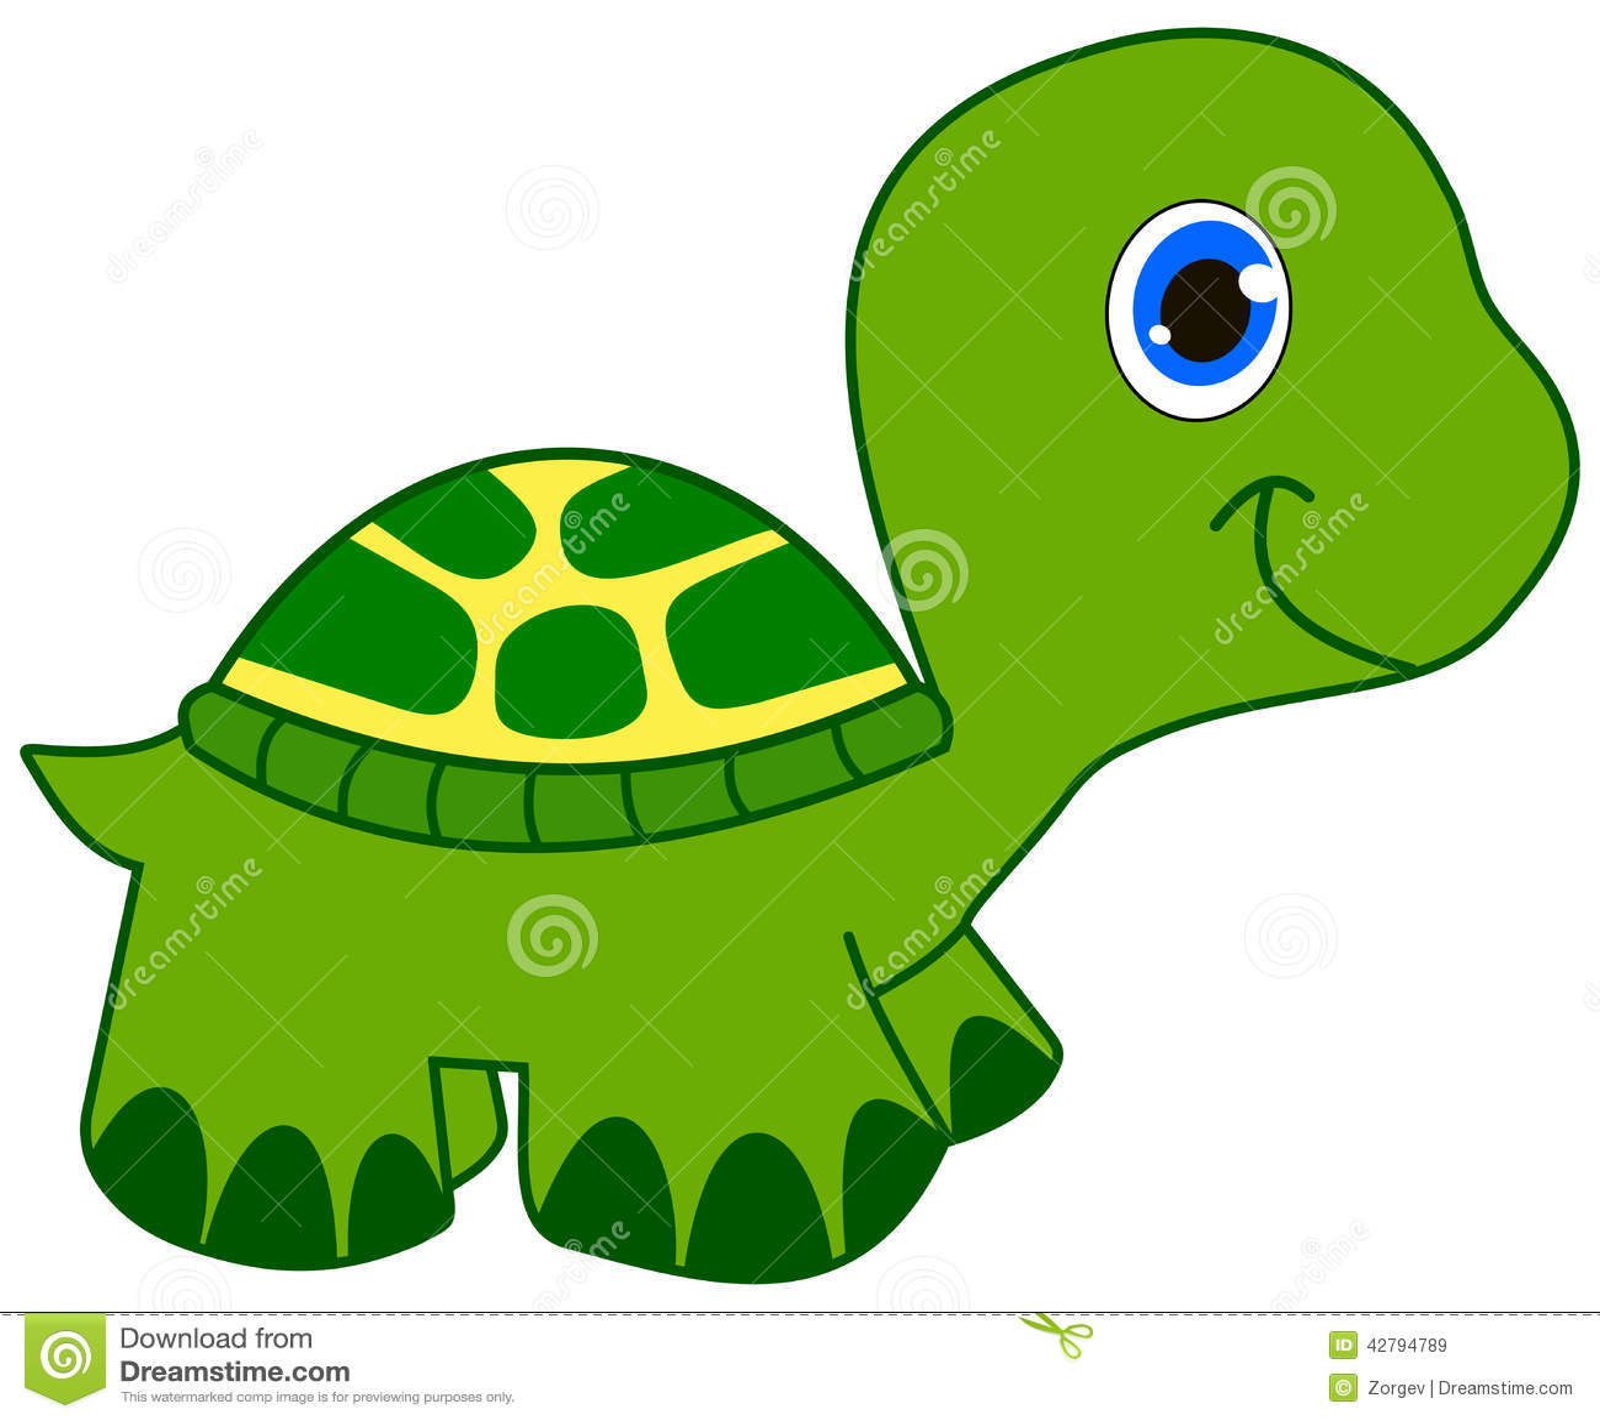 green turtle clip art - photo #33